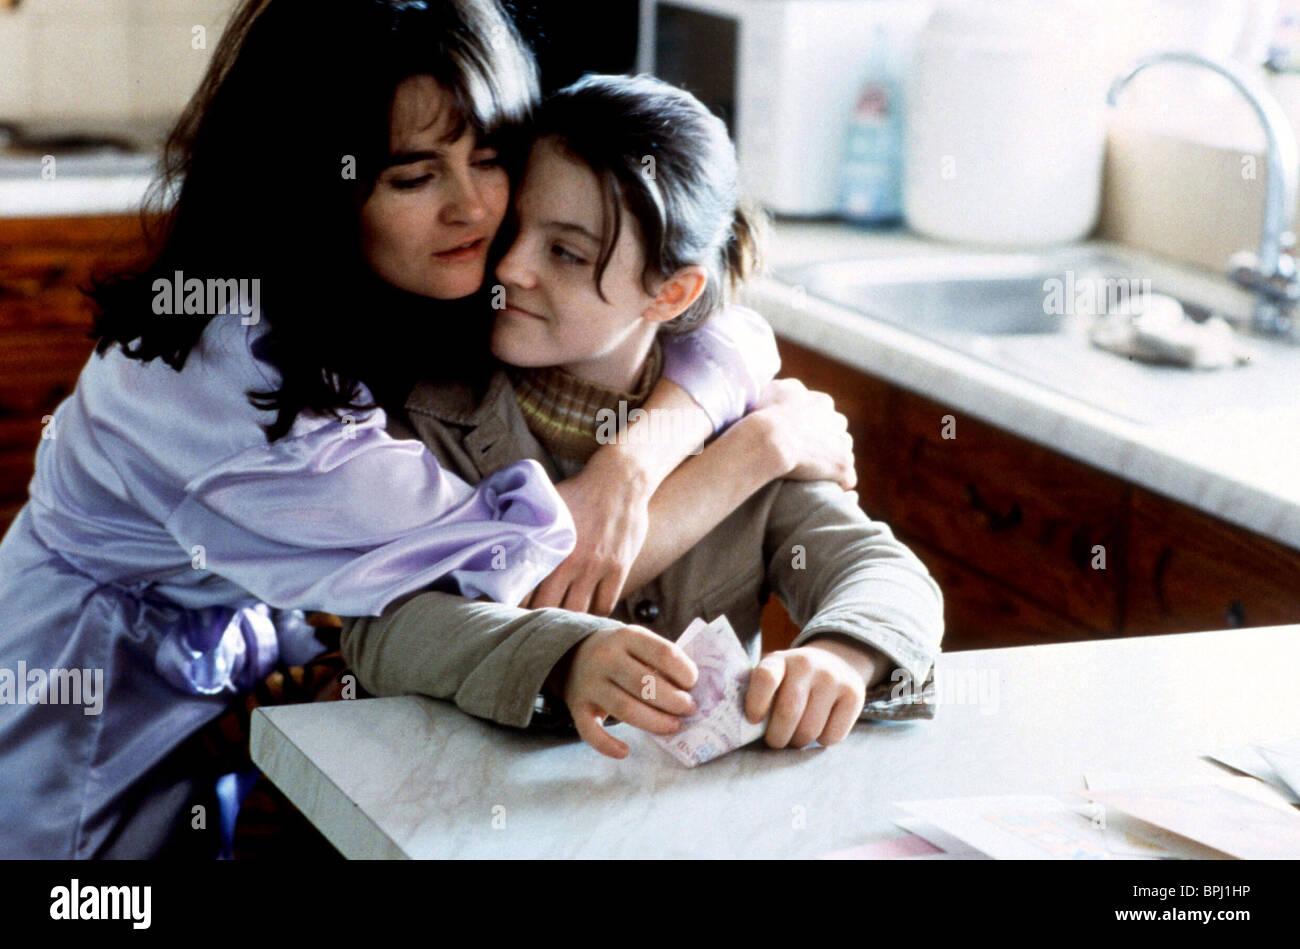 Joanne Quintas (b. 1976) Sex pics & movies Mimi Gibson,Naomi Kahoilua Wilson